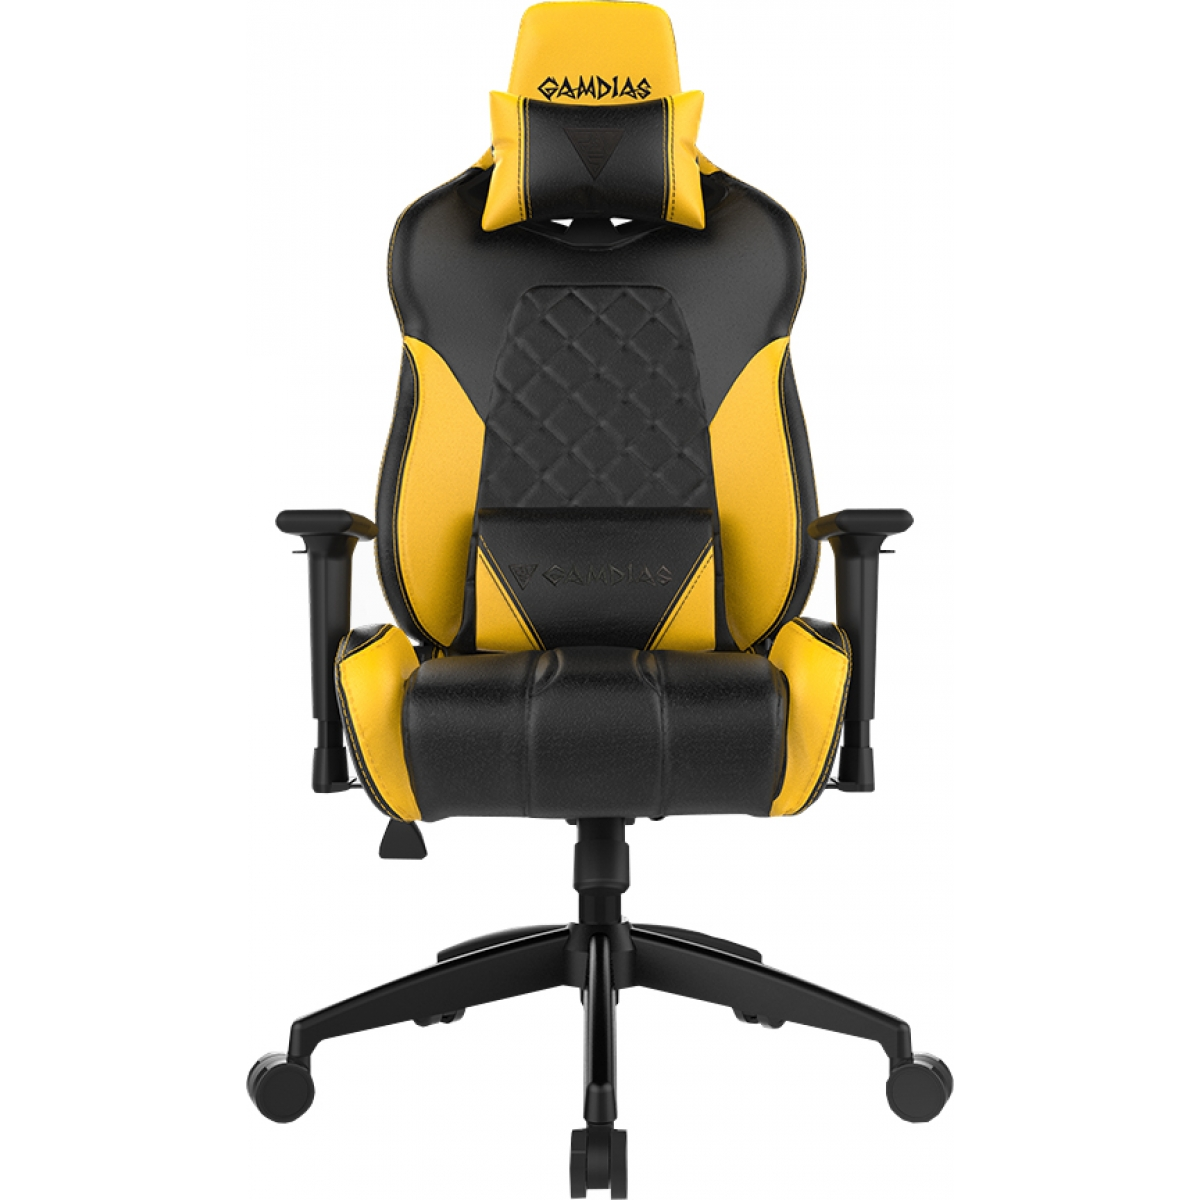 Cadeira Gamer Gamdias Achilles RGB E1 L, Black-Yellow, GD-ACHILLESE1LBY